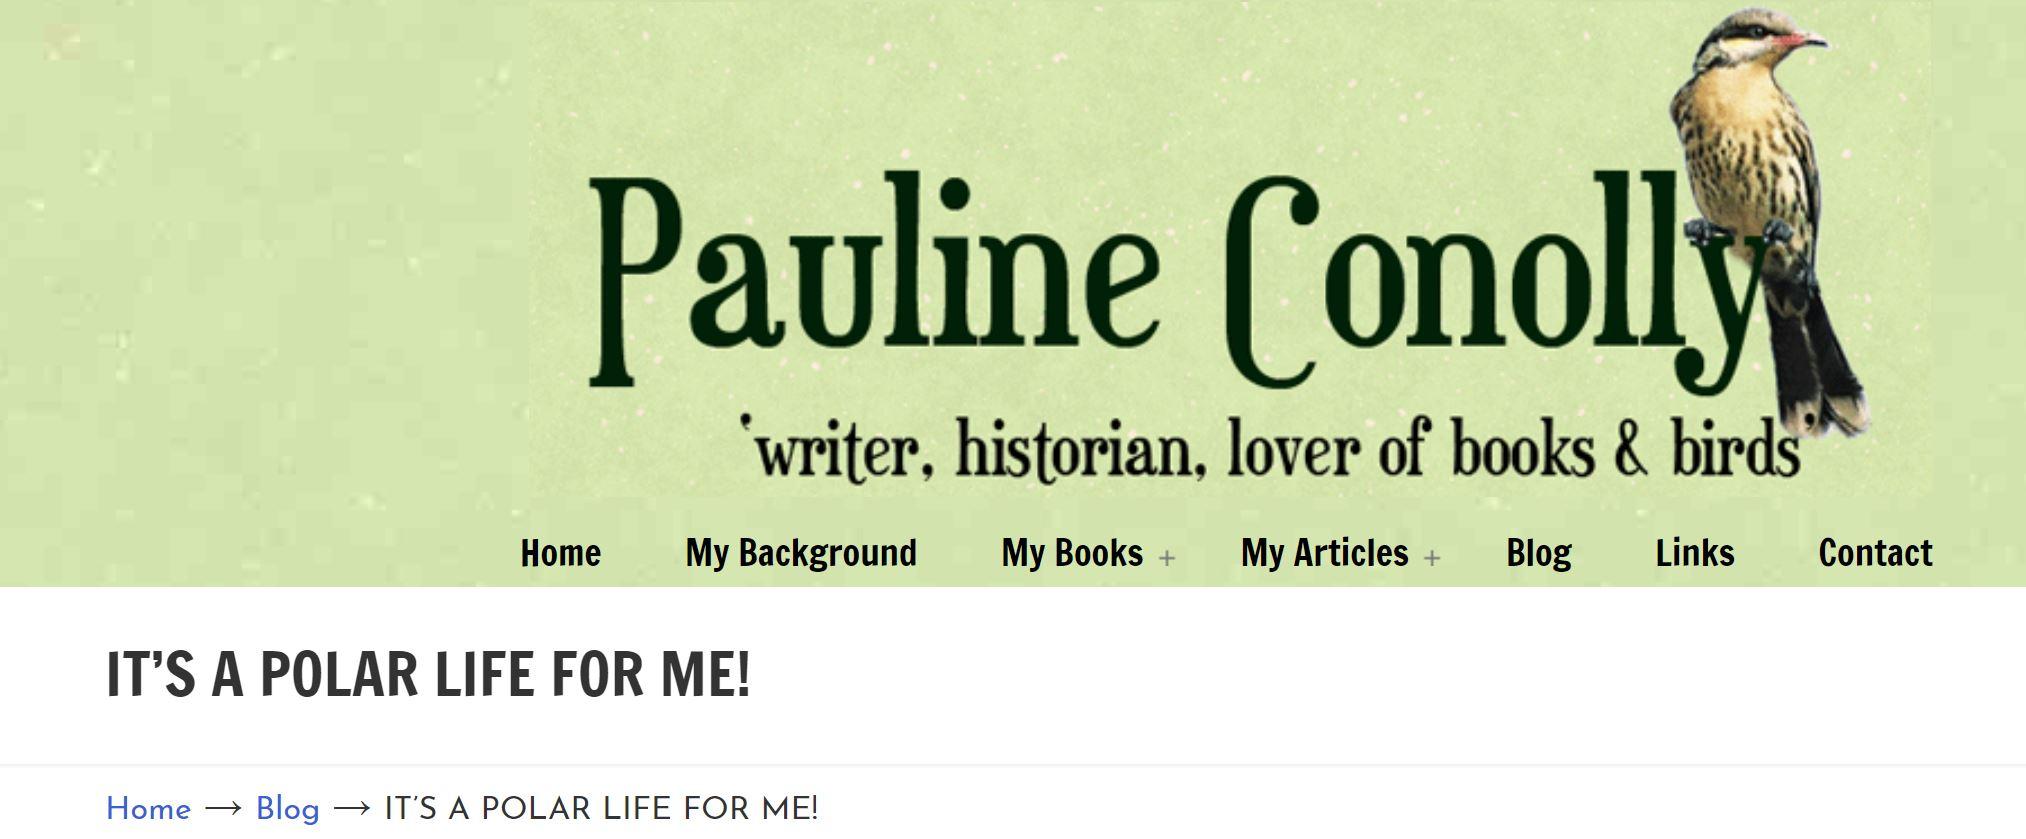 Pauline Conolly Blog